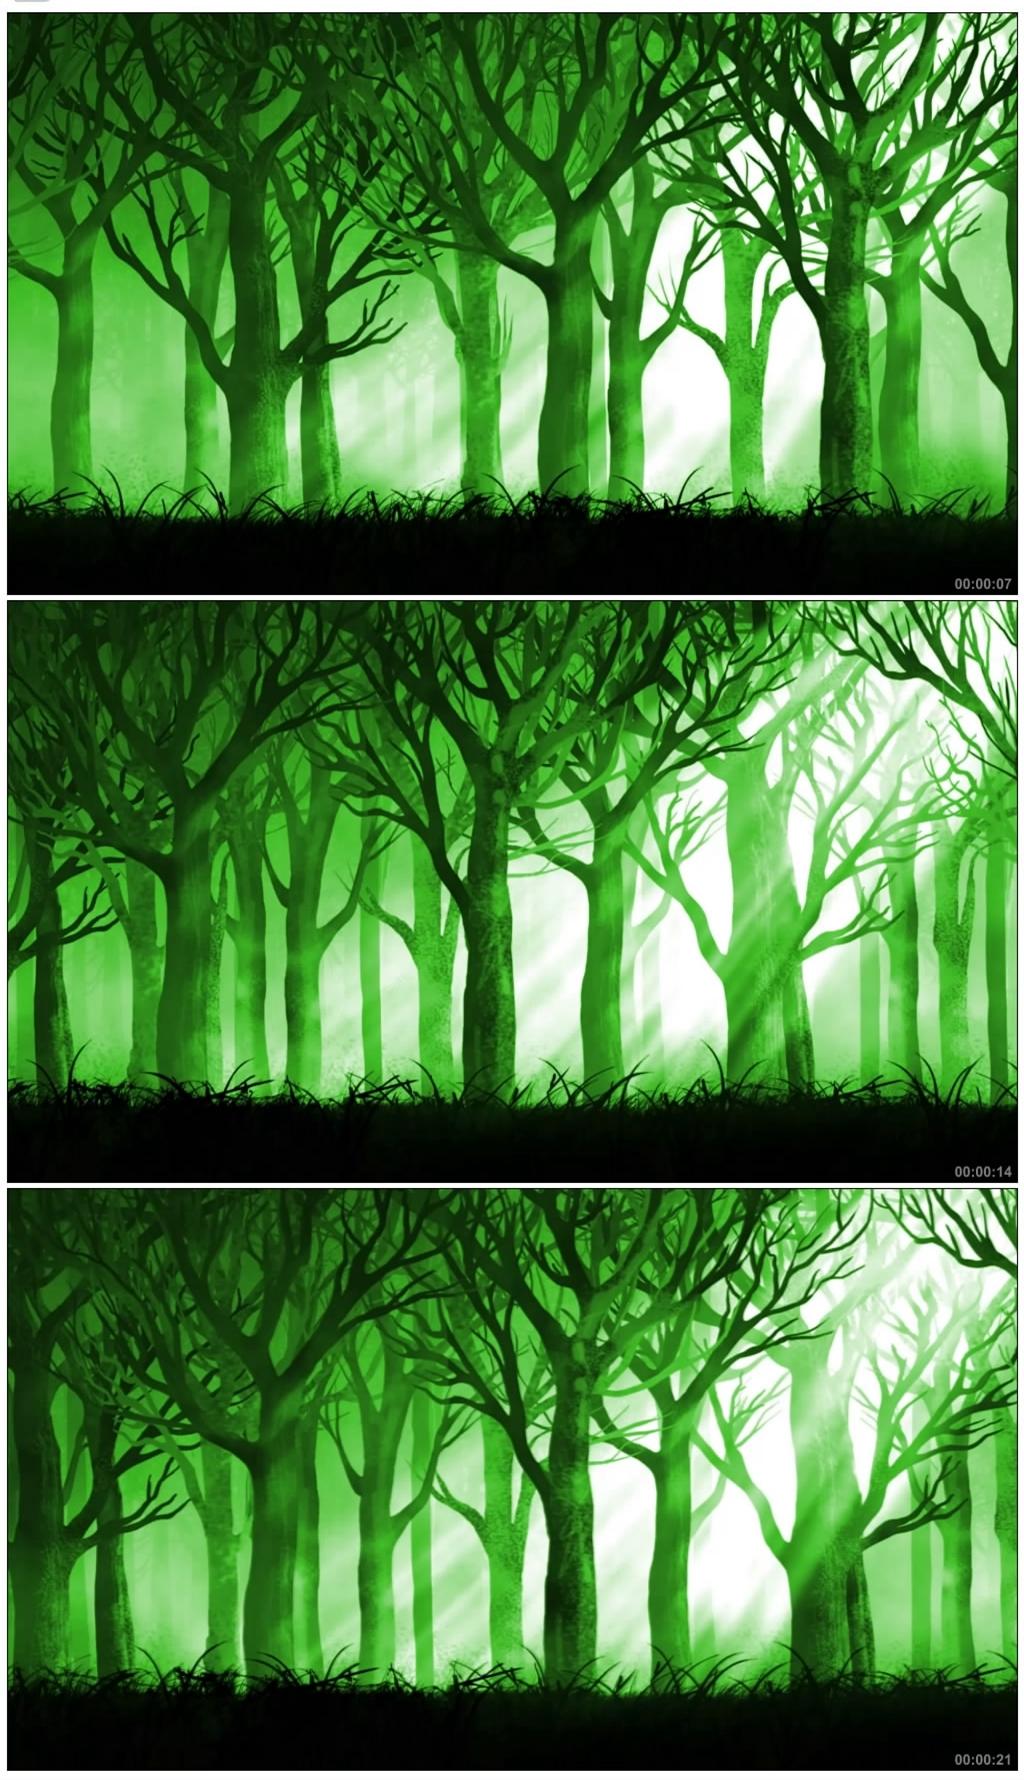 S952 动态绿色卡通童话森林背景视频素材